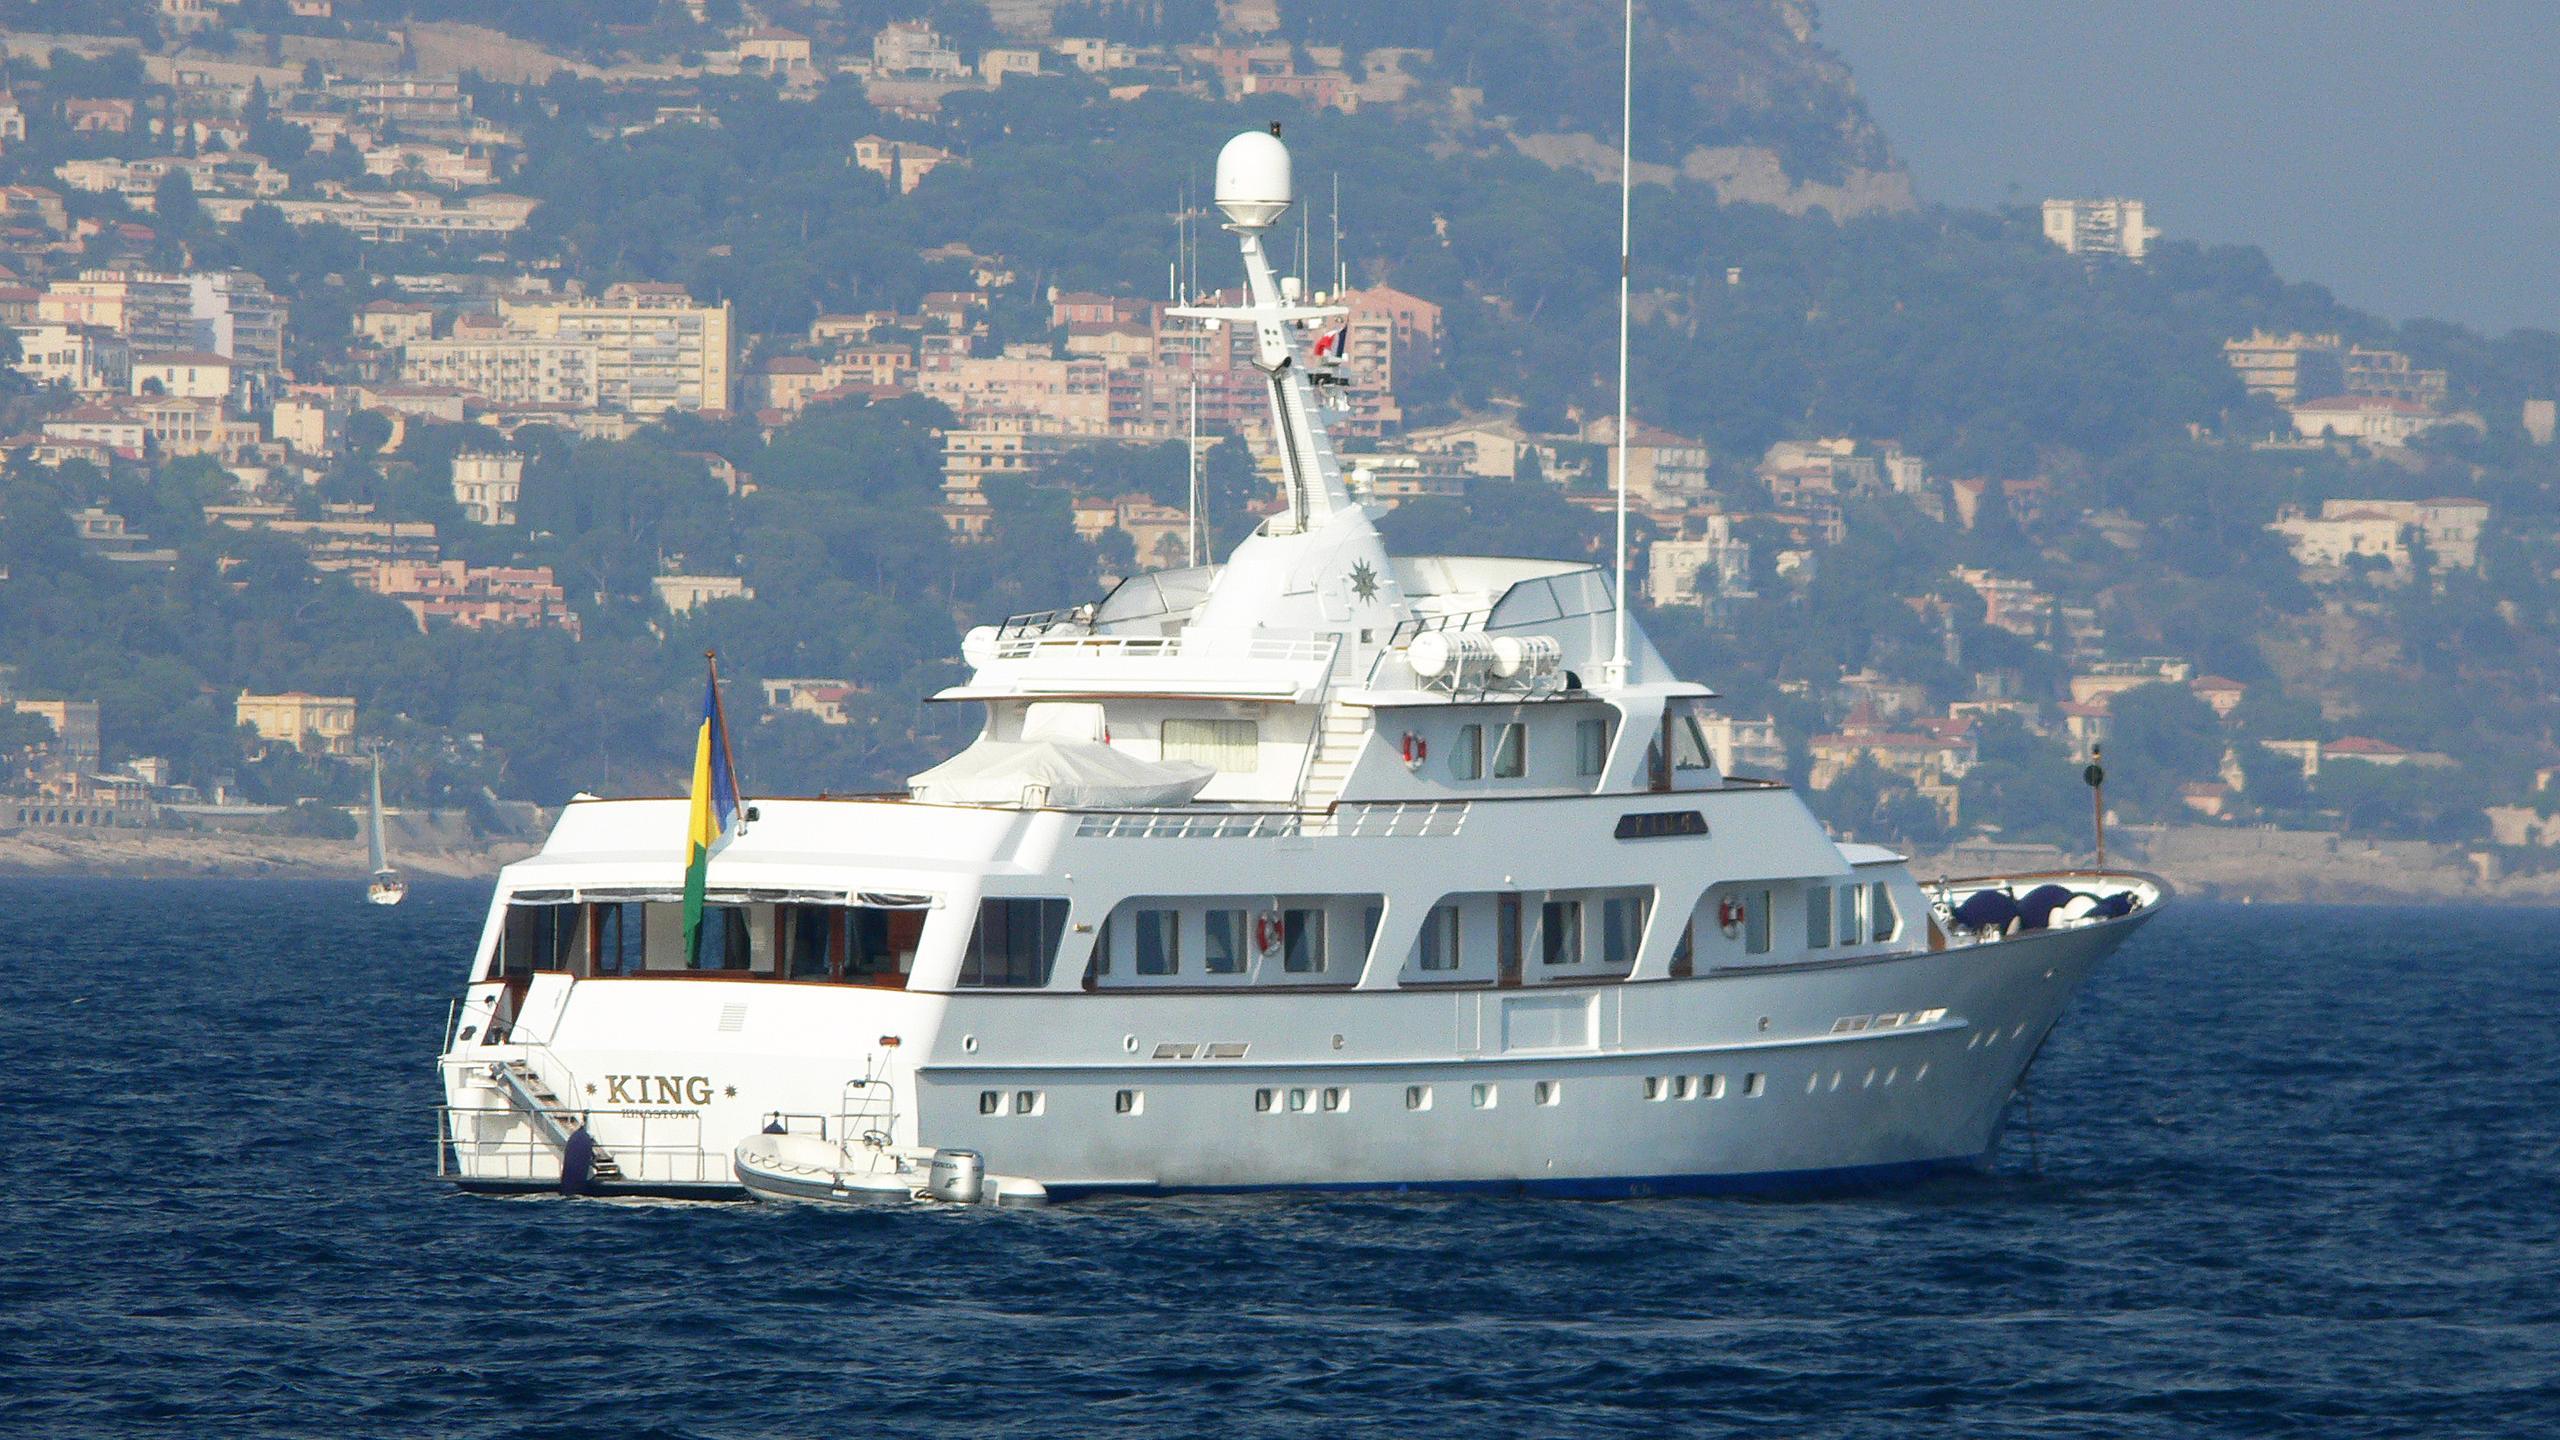 king-k-motor-yacht-feadship-1981-42m-stern